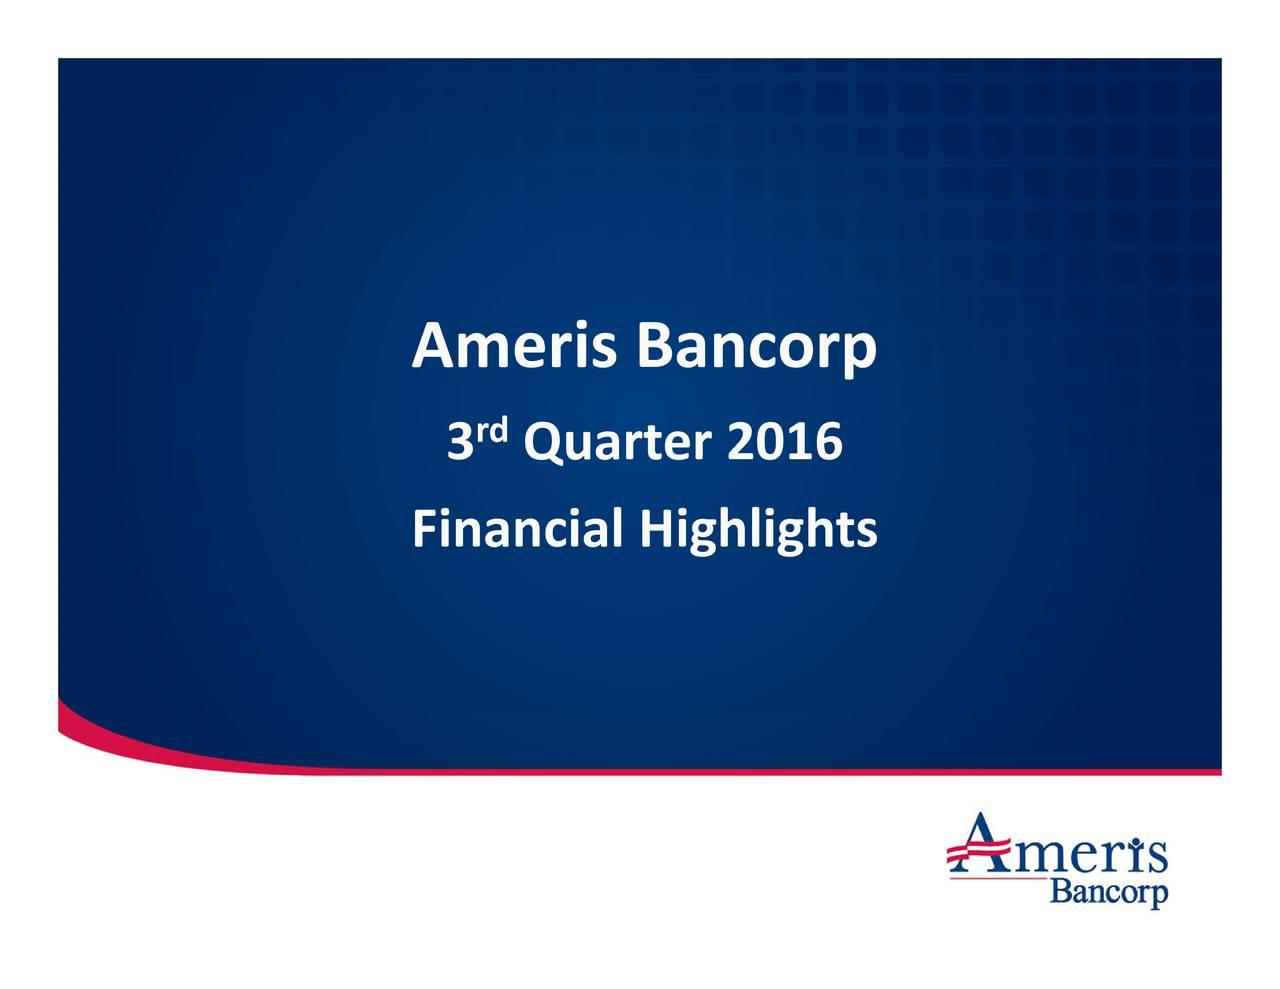 ancorp ighlights Quarter rd Ameris Financial